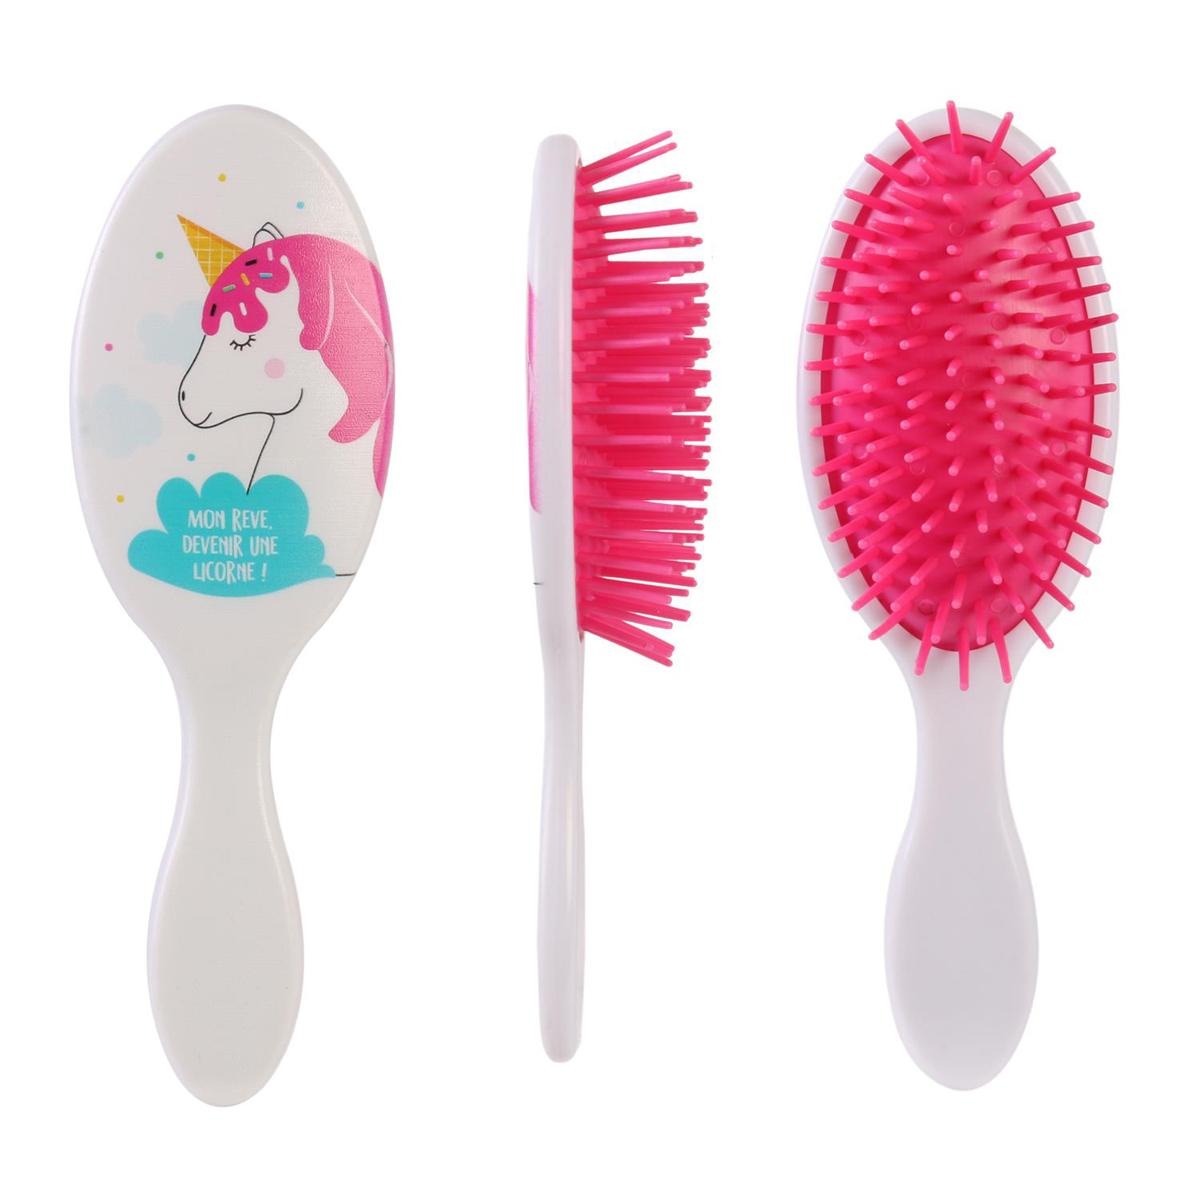 Brosse à cheveux \'Licorne My Unicorn\' blanc rose (Mon rêve devenir une licorne !) - 165x55 cm - [Q7712]